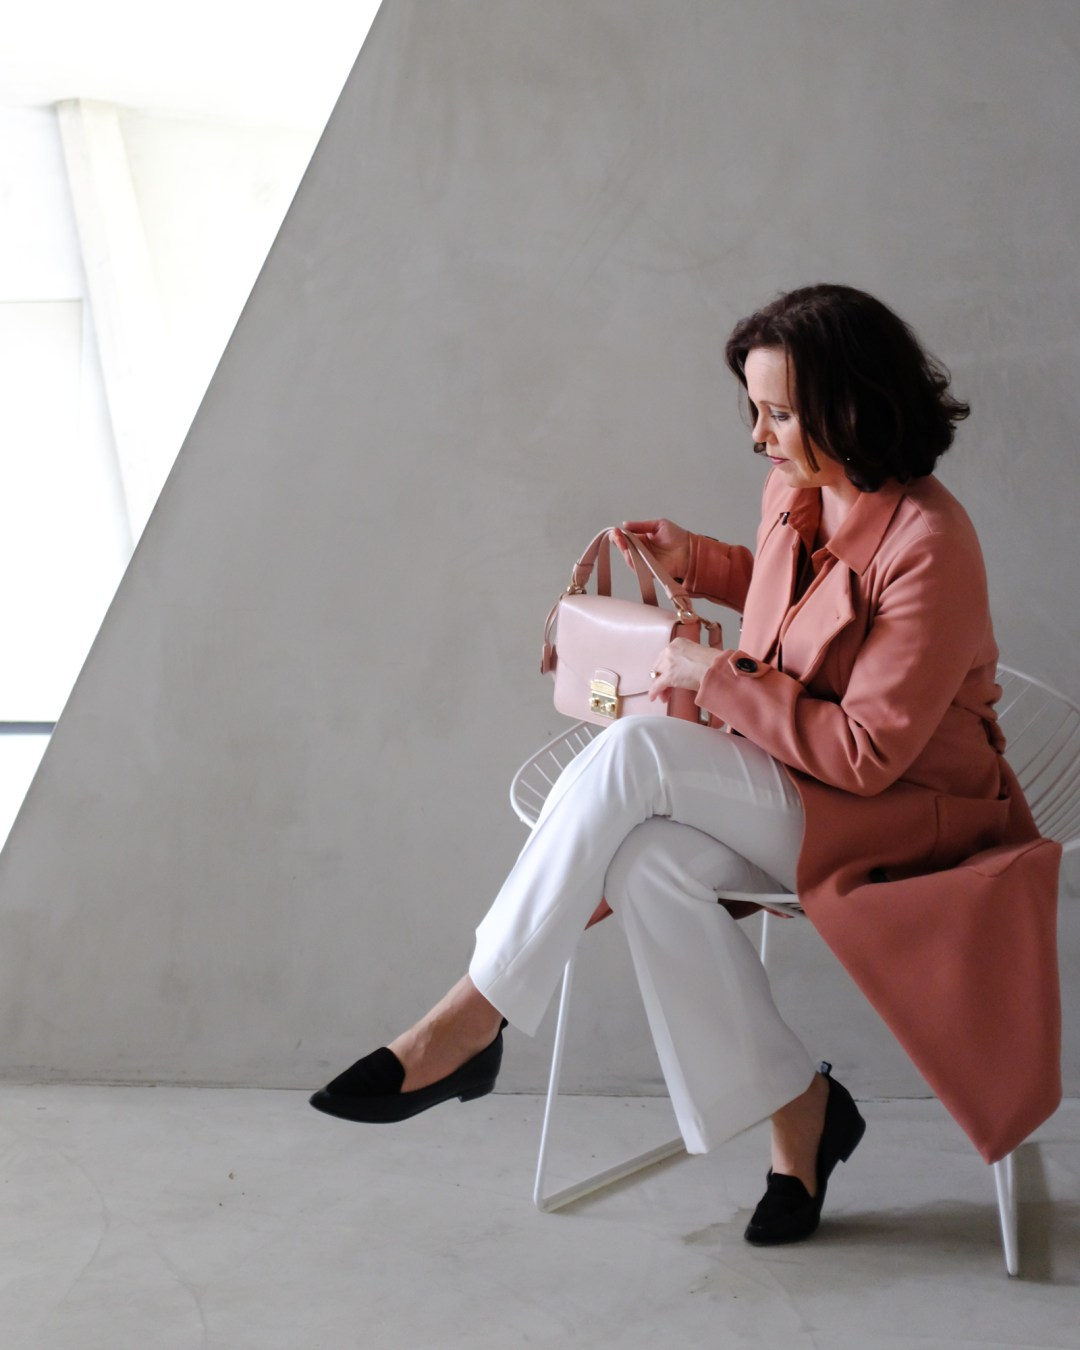 inastil, Trenchcoat, Springcoat, Frühjahrsmode, Stilberatung, Ü50Mode, Modeberatung, Frühlingsfarben, Modeblogger-16